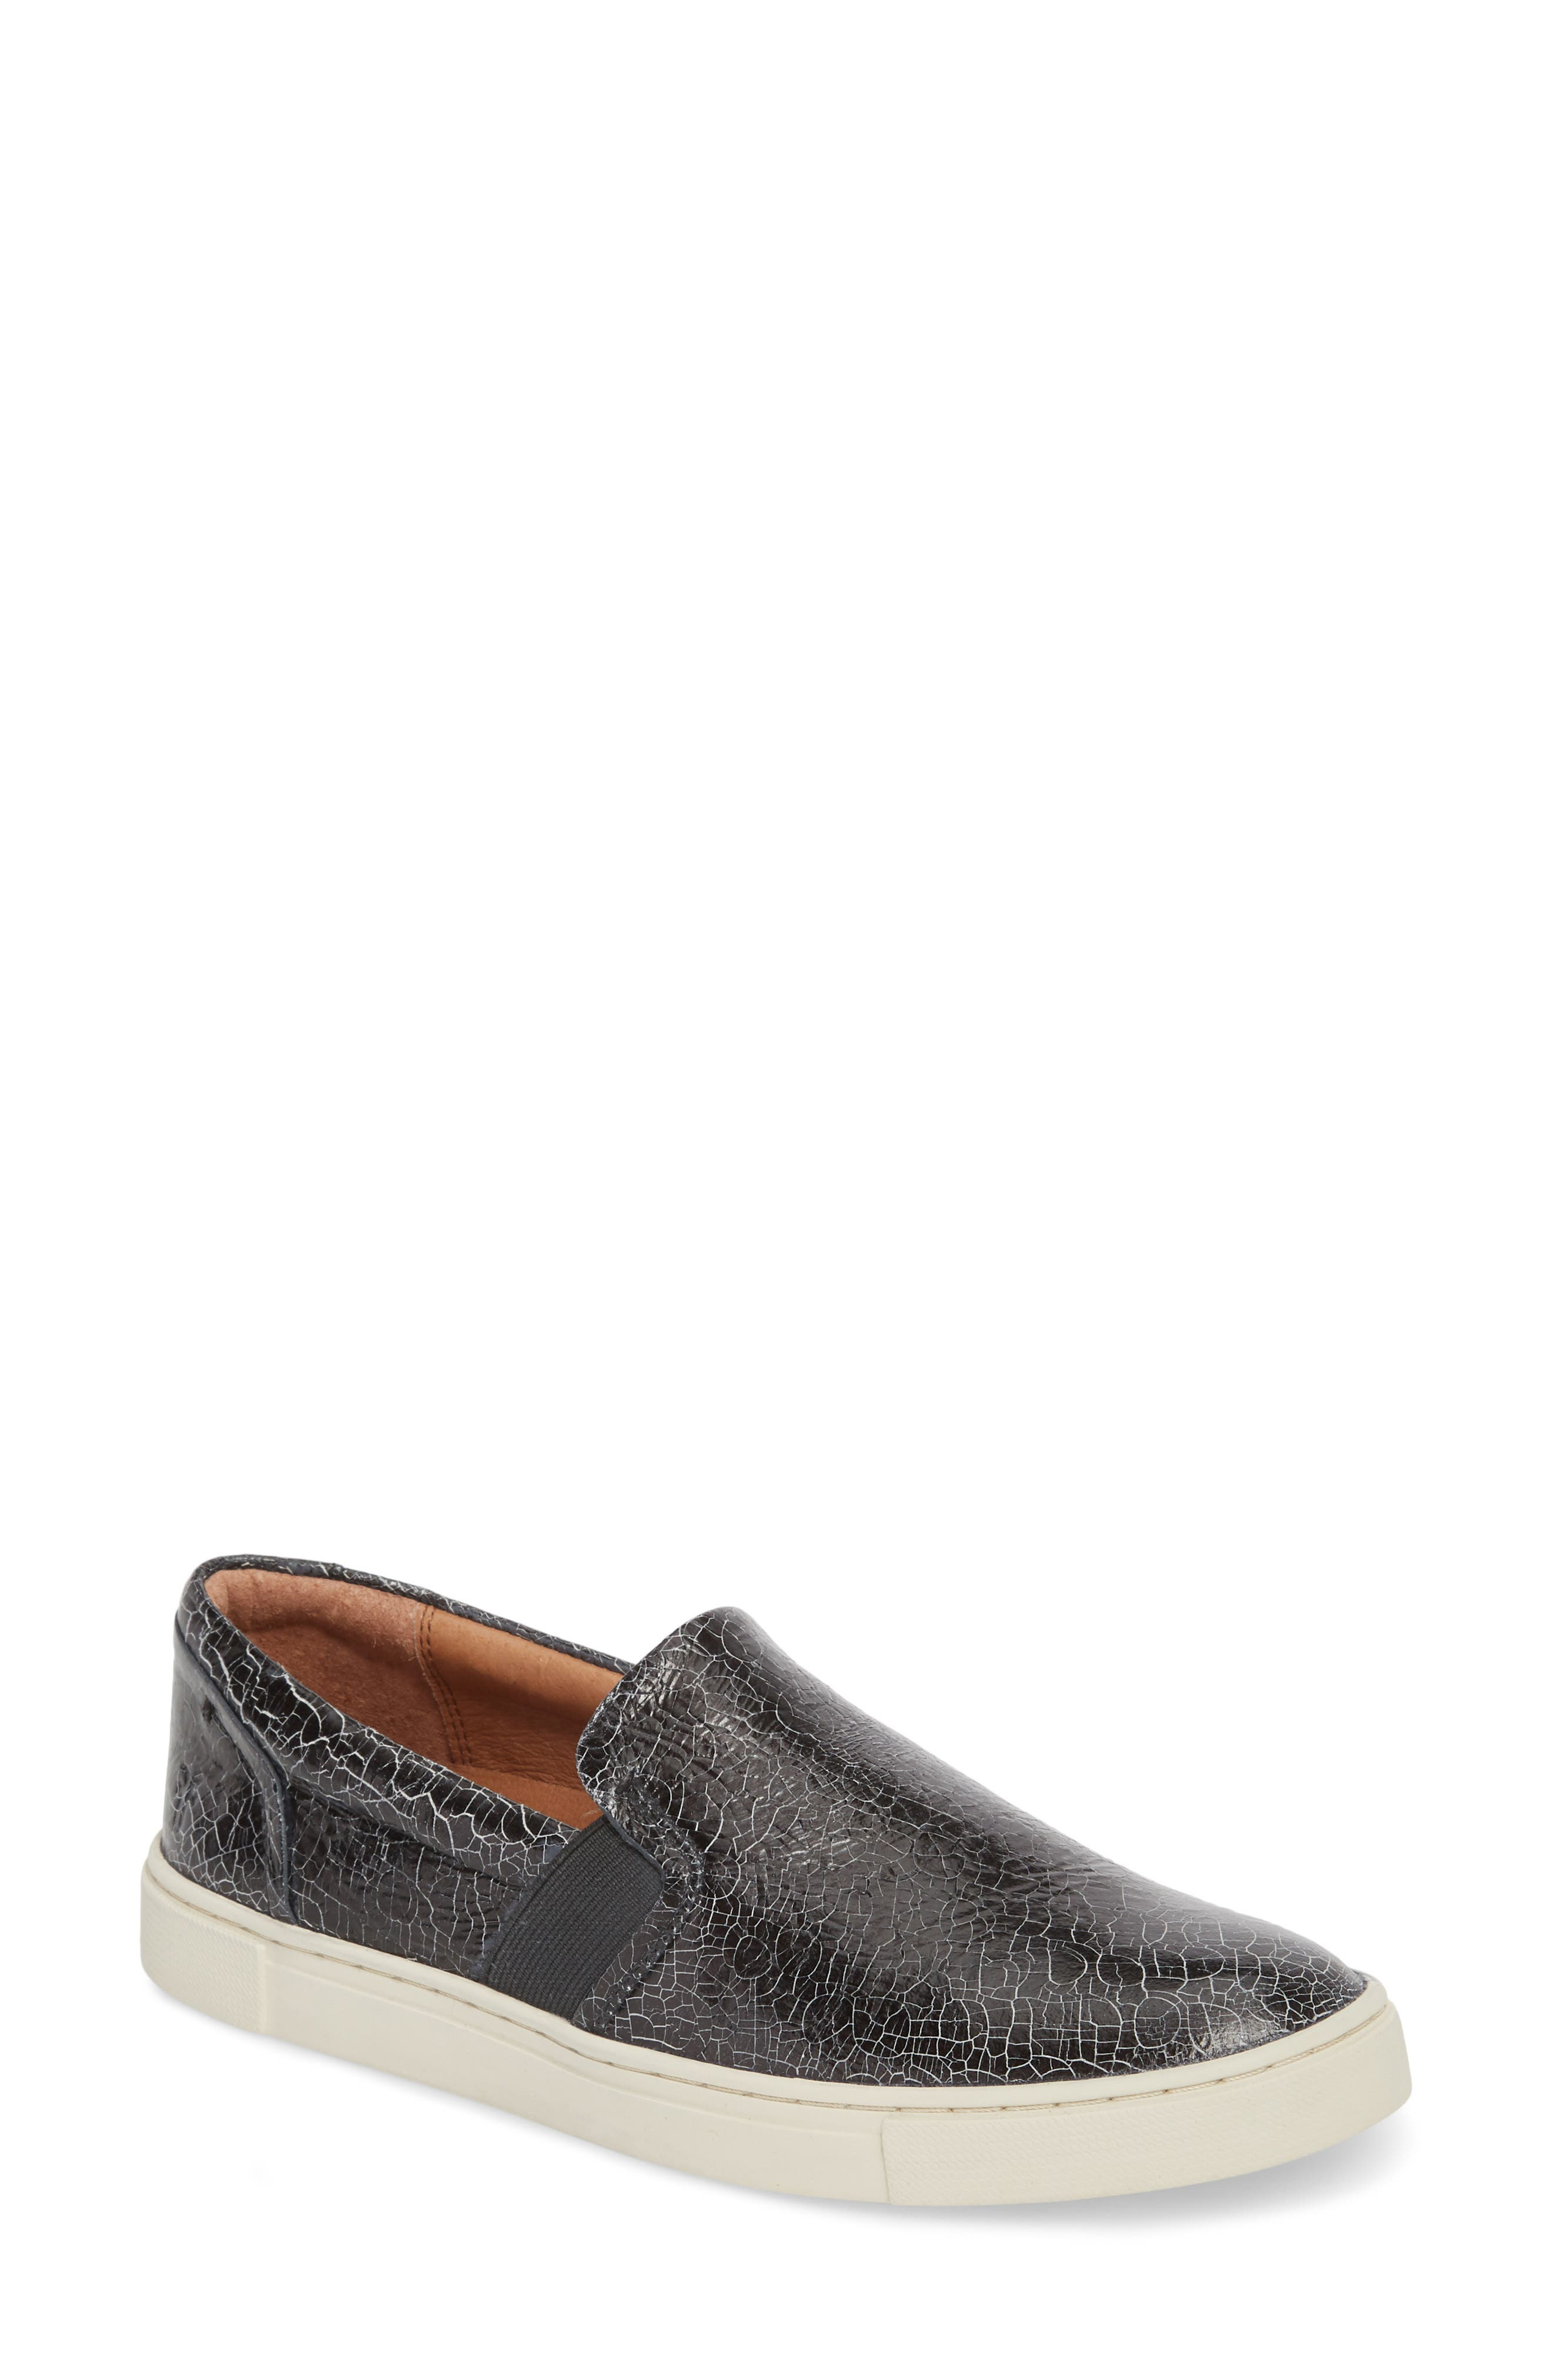 Ivy Slip-On Sneaker,                         Main,                         color, Black